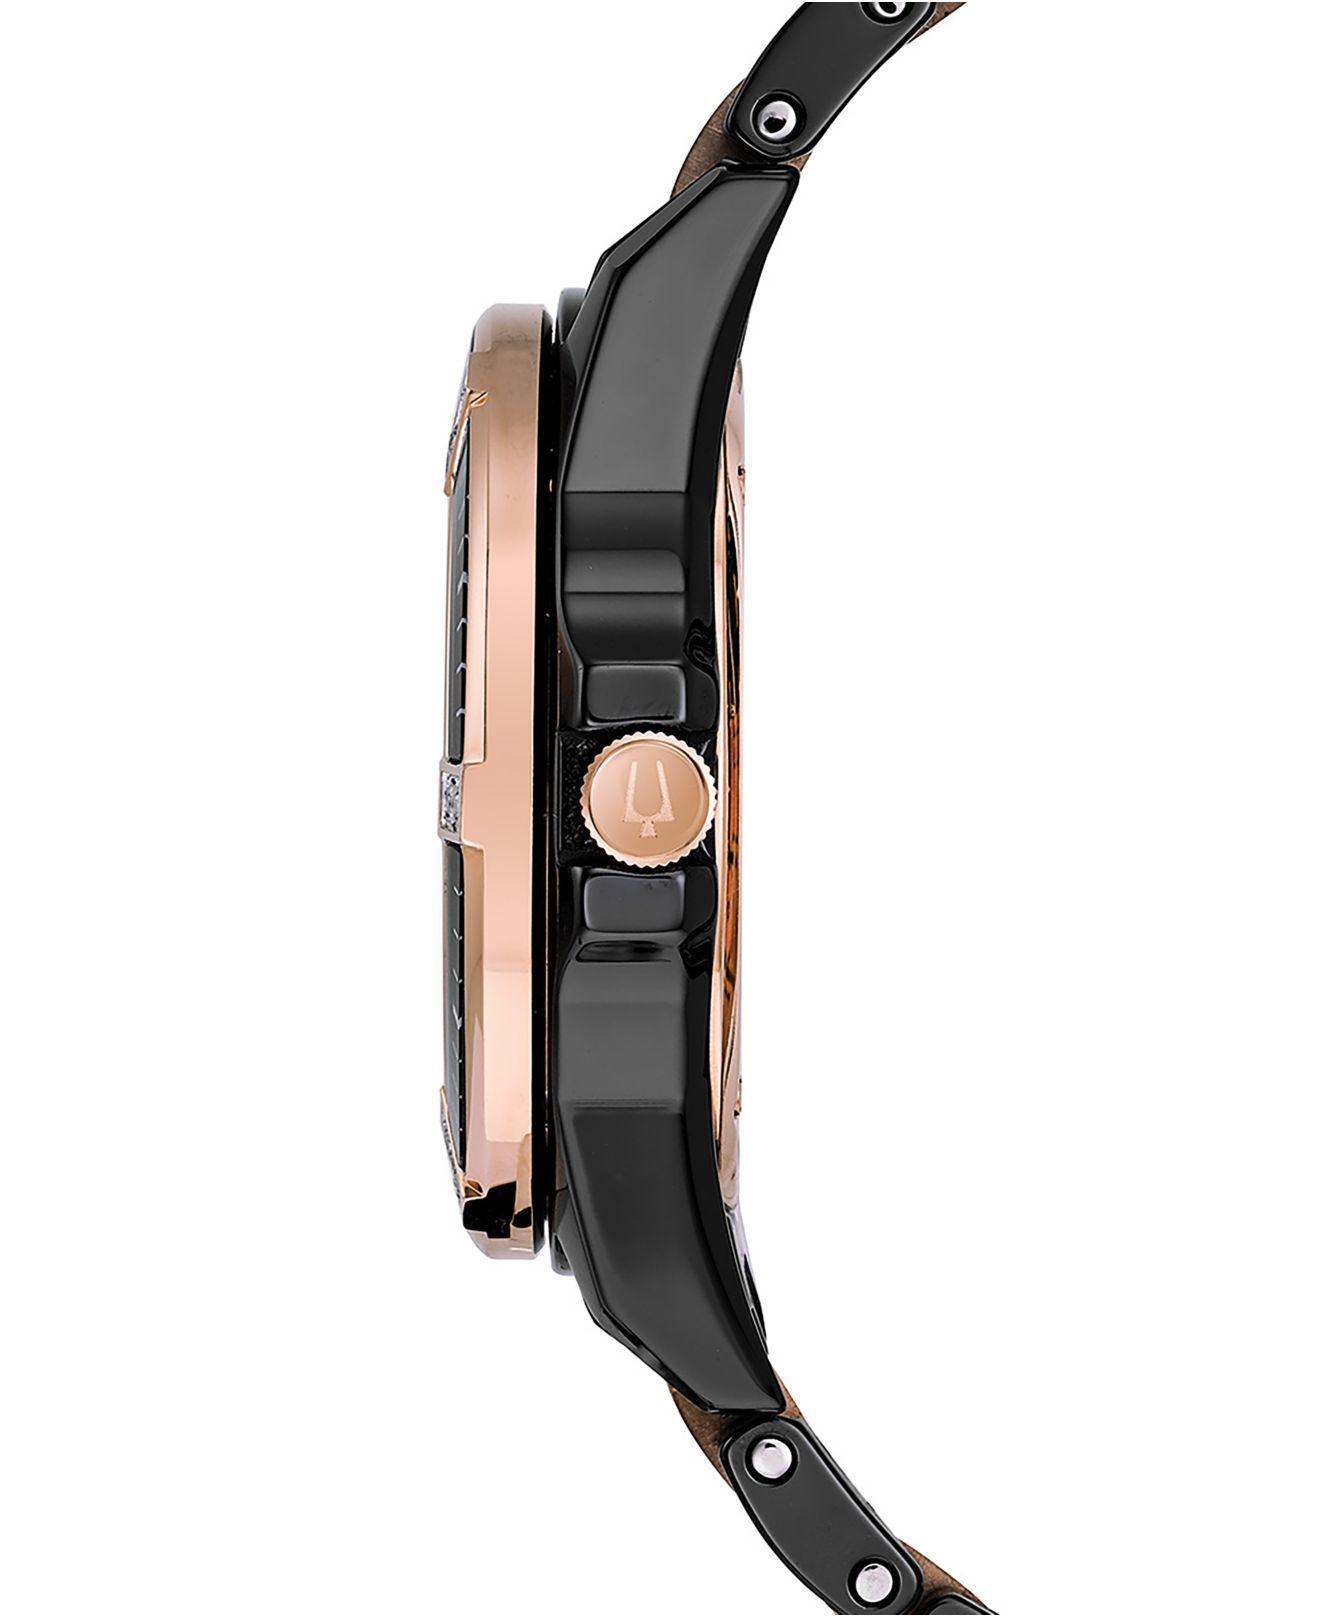 ce65839afba0 Bulova Women s Diamond-accent Marine Star Two-tone Ceramic Bracelet Watch  37mm in Black - Save 6% - Lyst